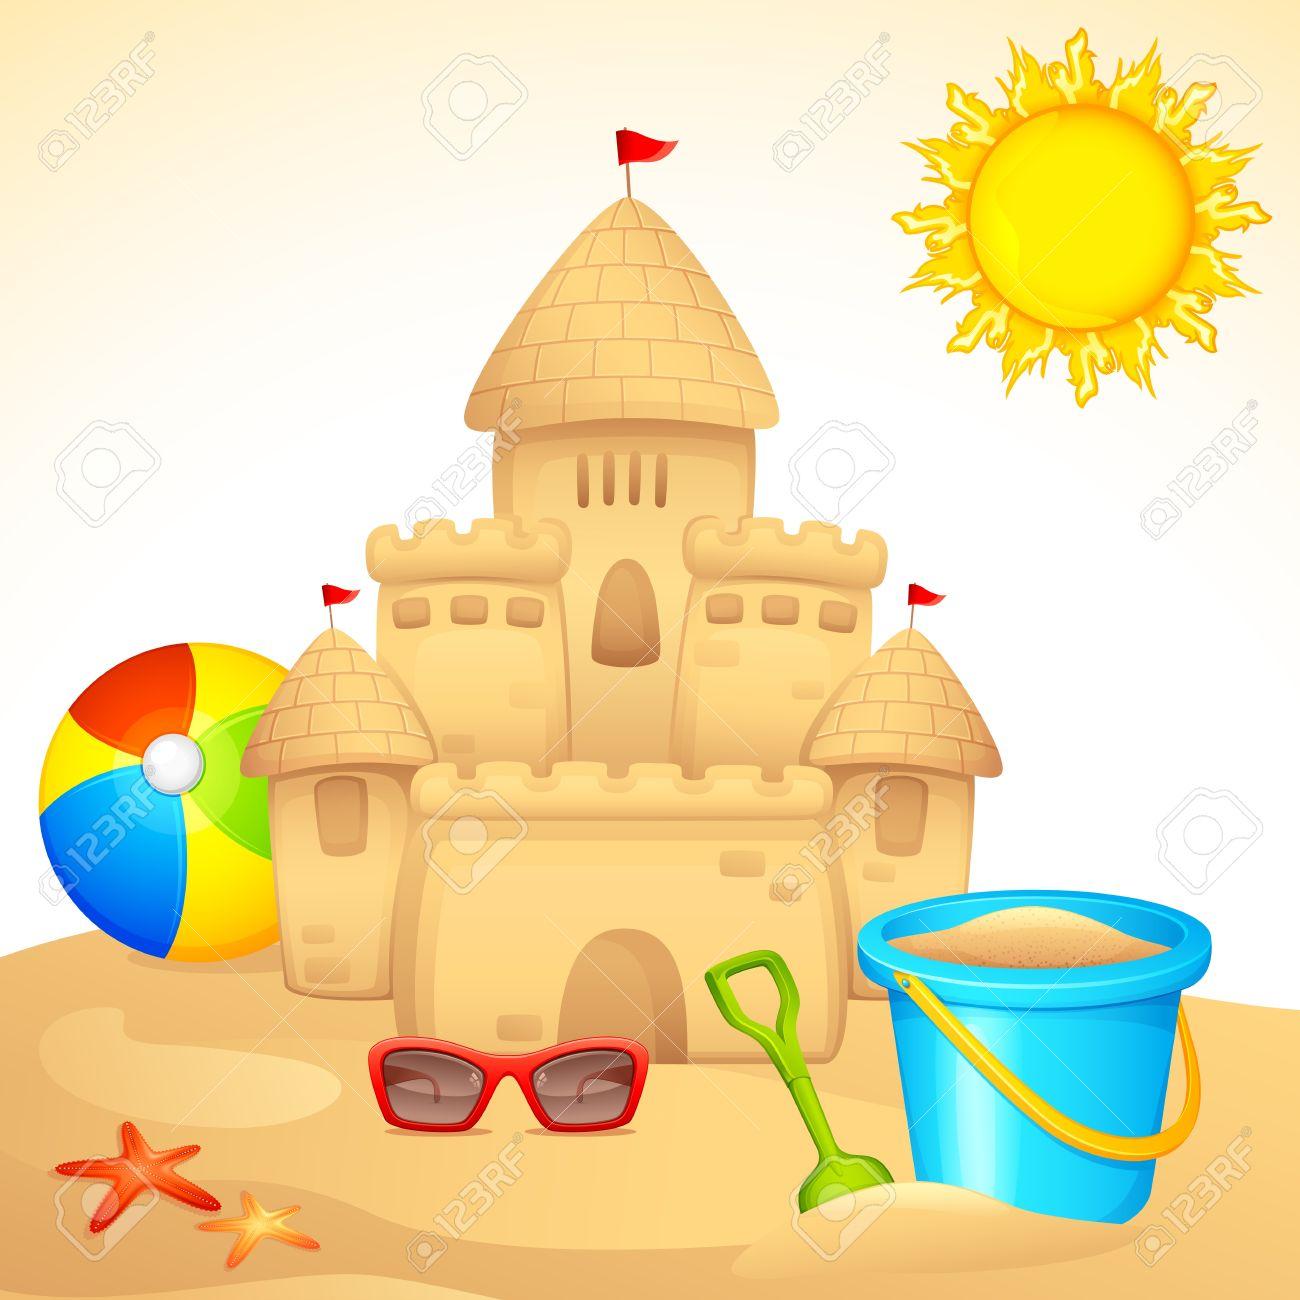 Sand castles clipart 3 » Clipart Station.